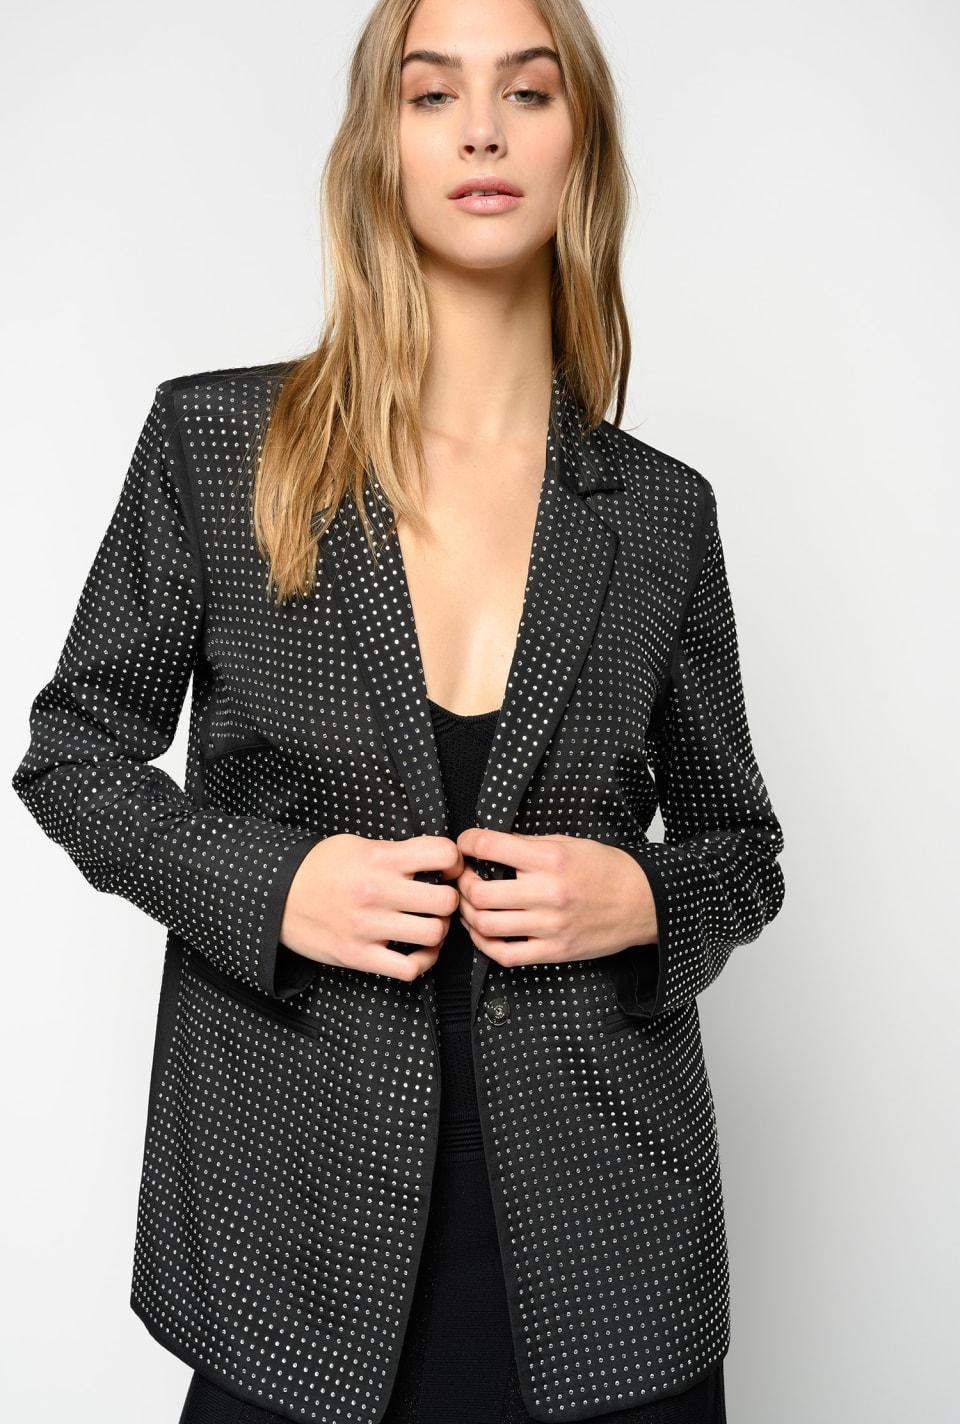 Full rhinestone blazer